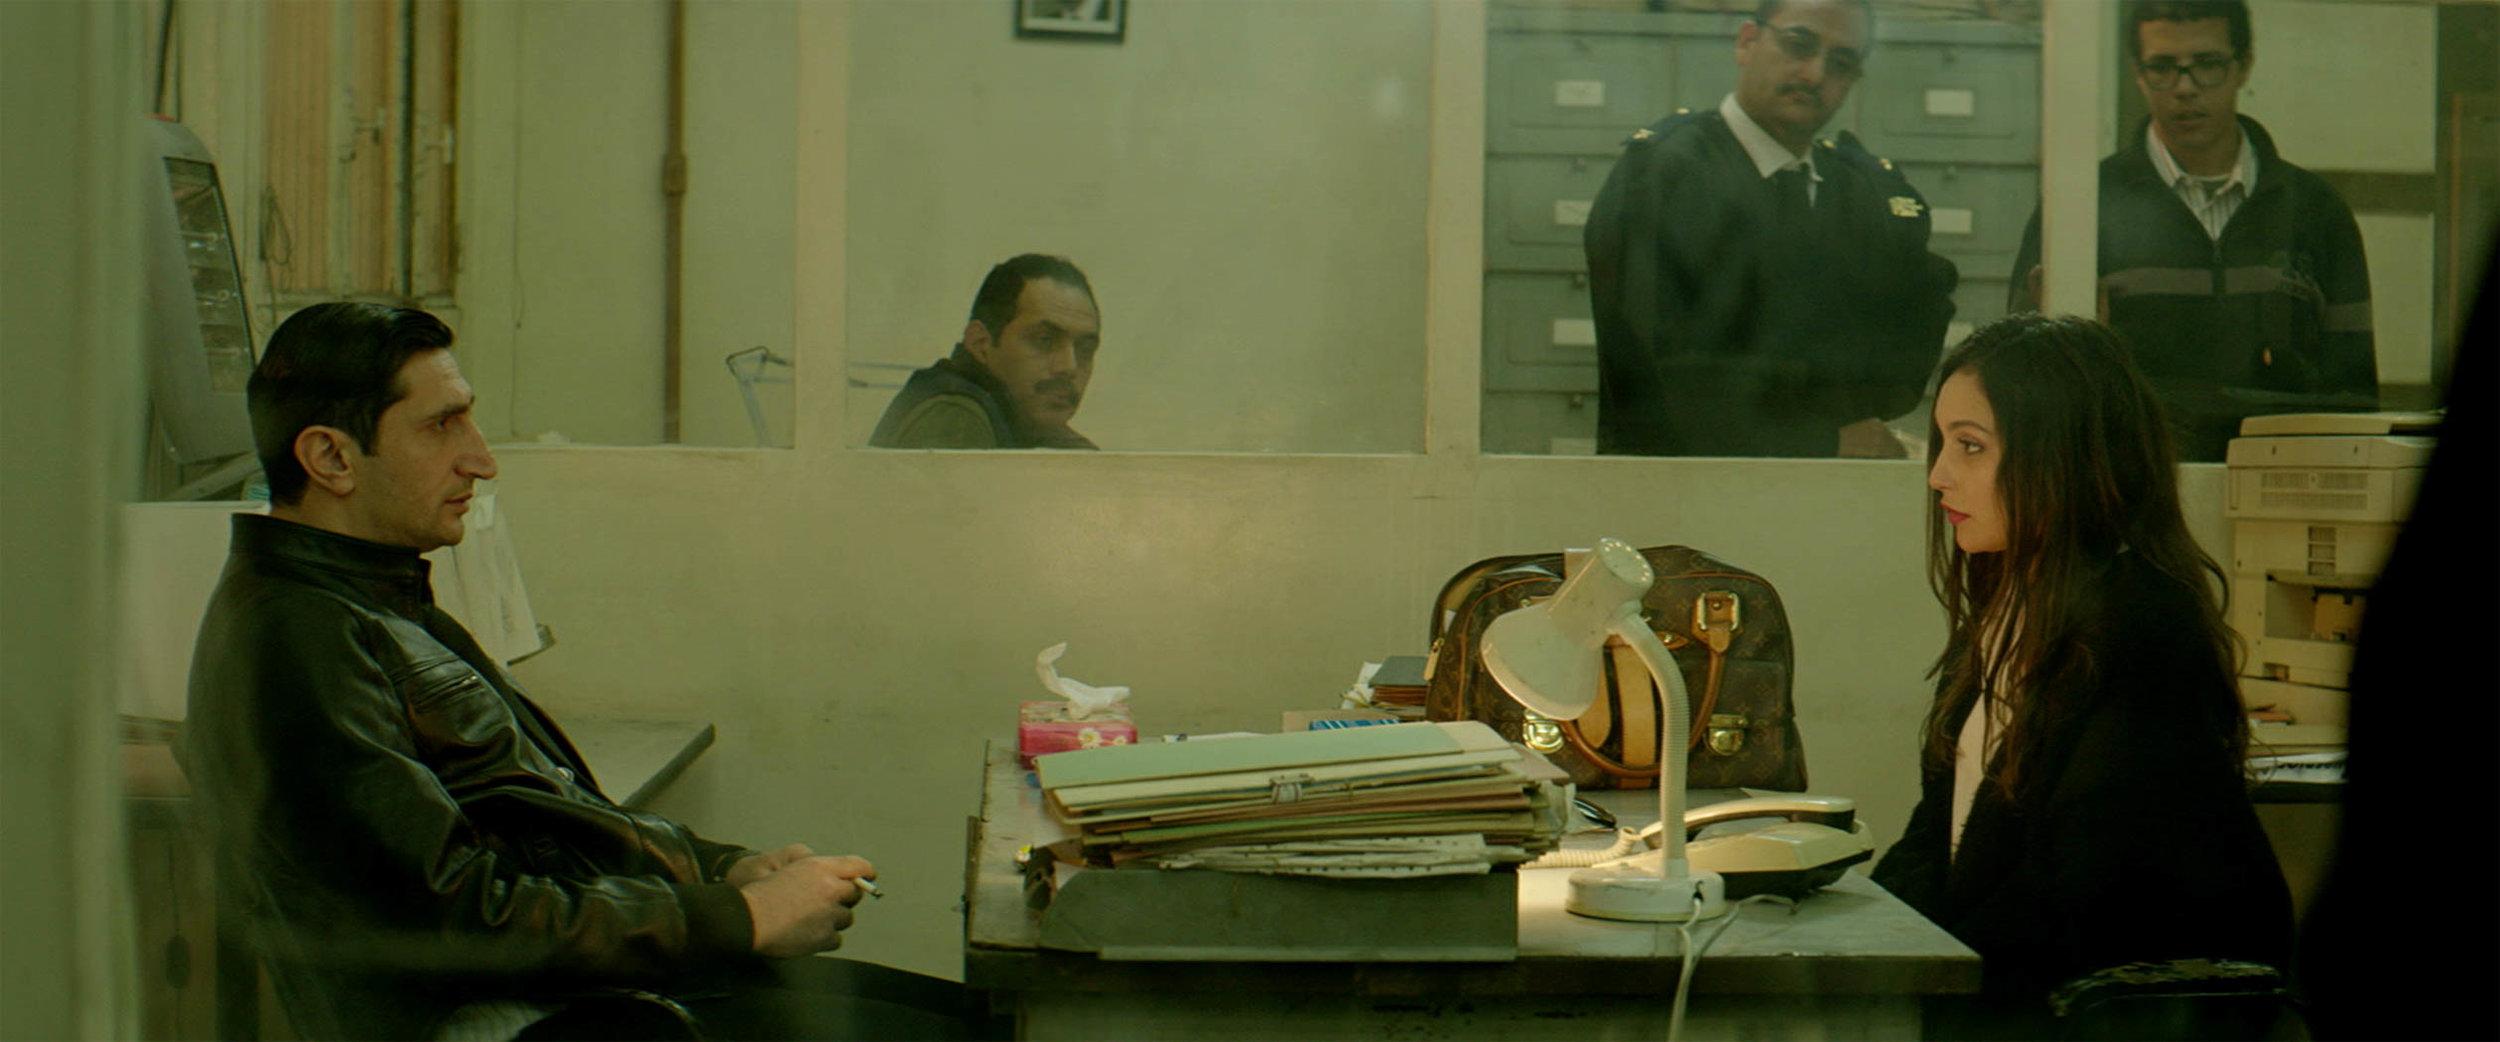 """The Nile Hilton Incident""  - Dir. Tarik Saleh Country: Egypt"